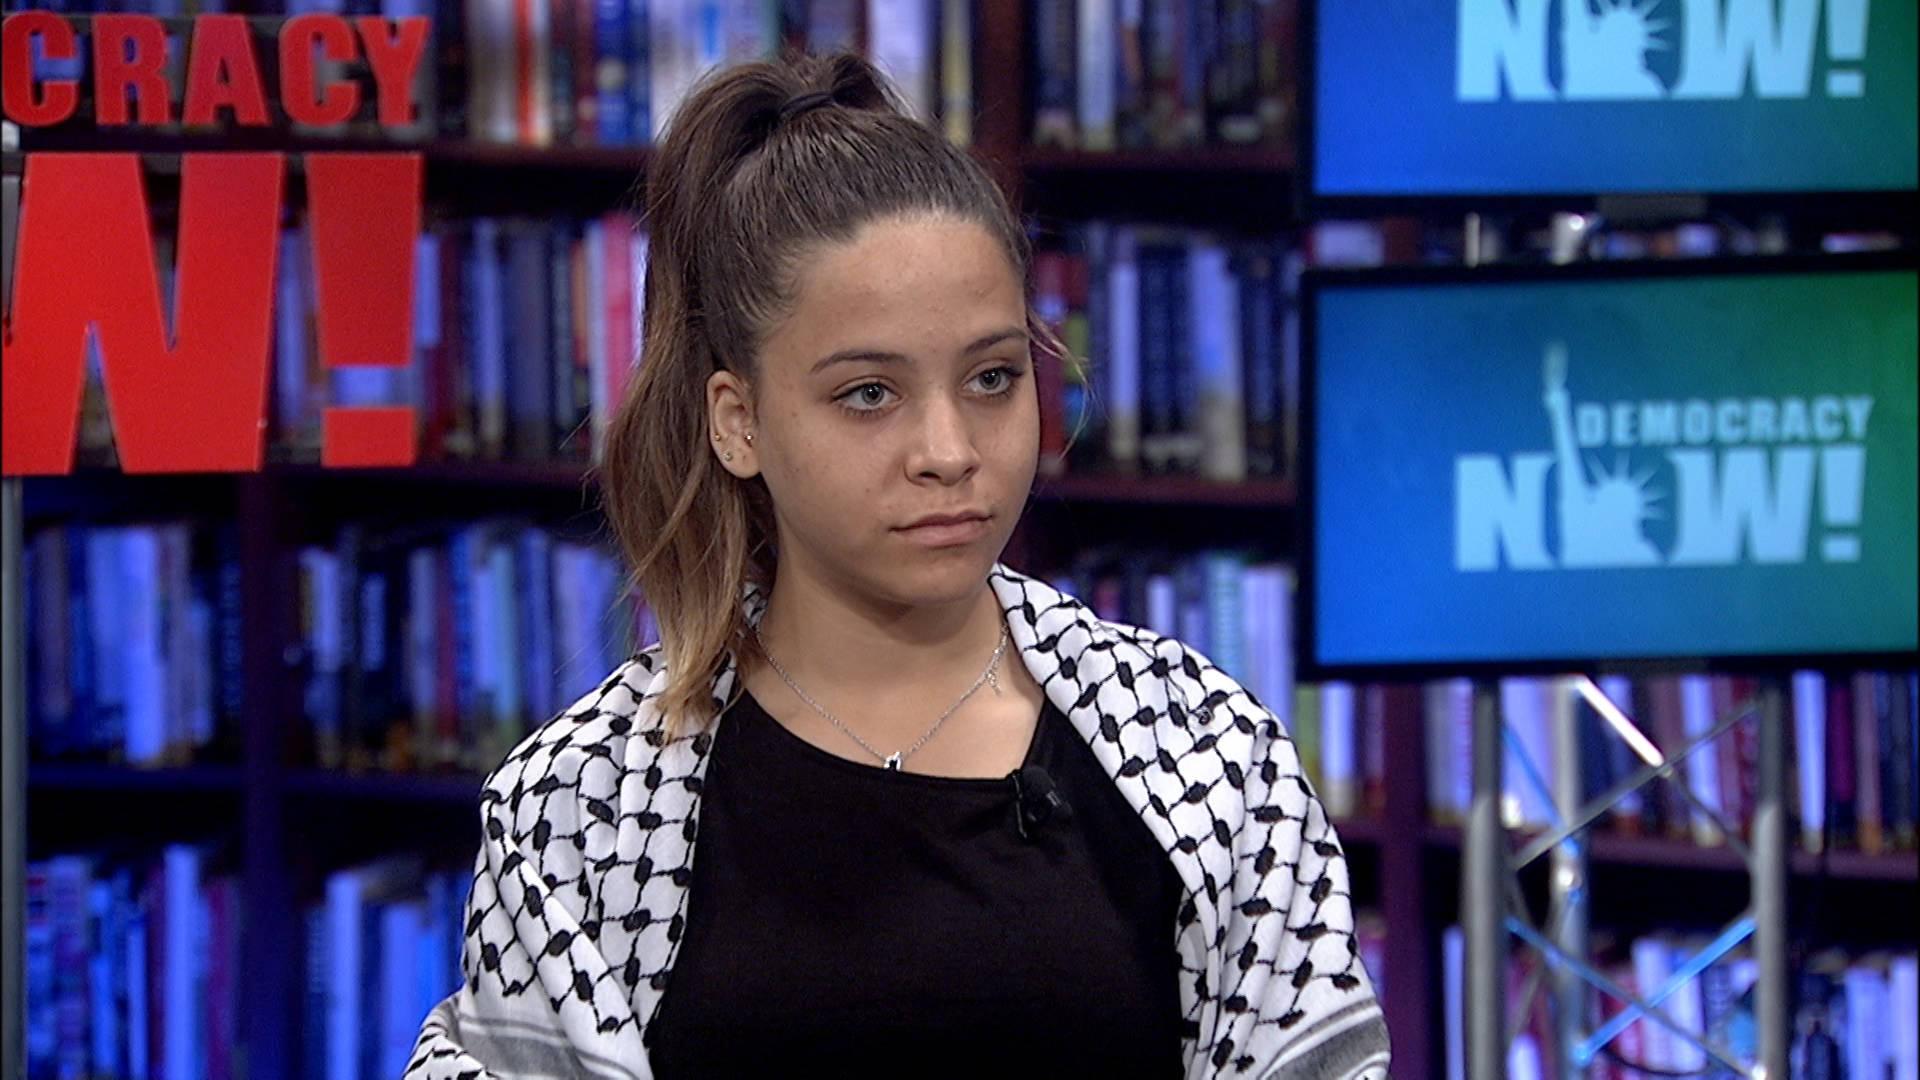 Meet Janna Jihad, the 13-Year-Old Palestinian Journalist Exposing the Israeli Occupation